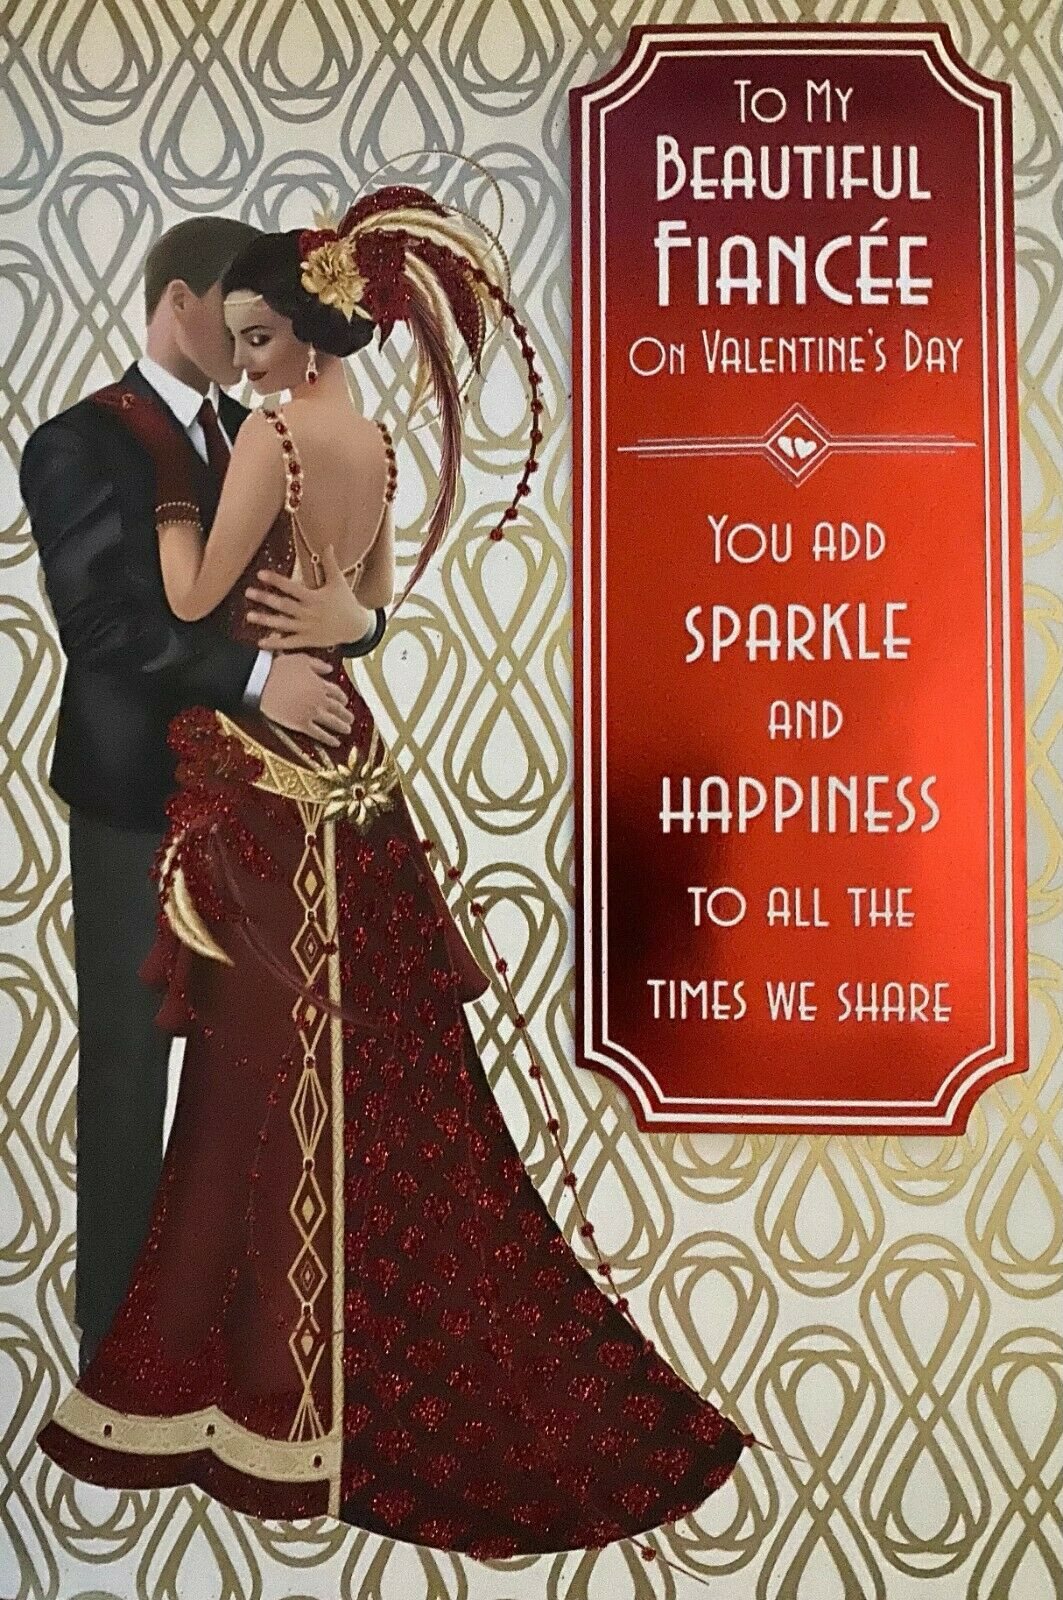 Valentine's Day Card To My Beautiful Fiancée On Valentine's Day - Art Deco